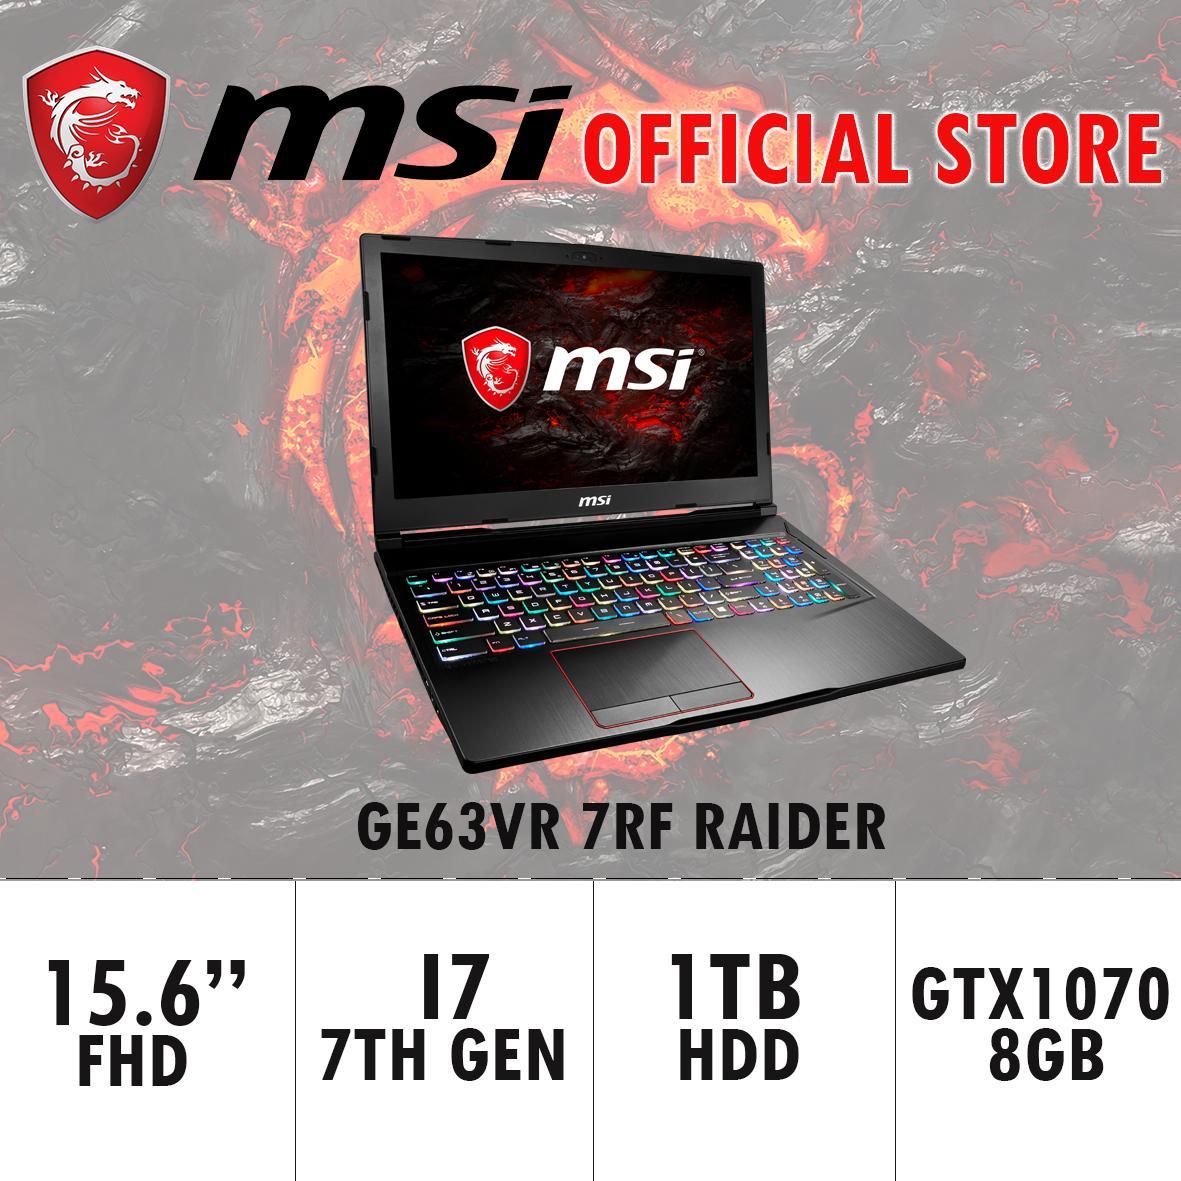 MSI GE63VR 7RF RAIDER – 262SG (I7-7700HQ/16GB DDR4/256GB SSD+1TB HDD 7200RPM/8GB NVIDIA GTX1070) GAMING LAPTOP